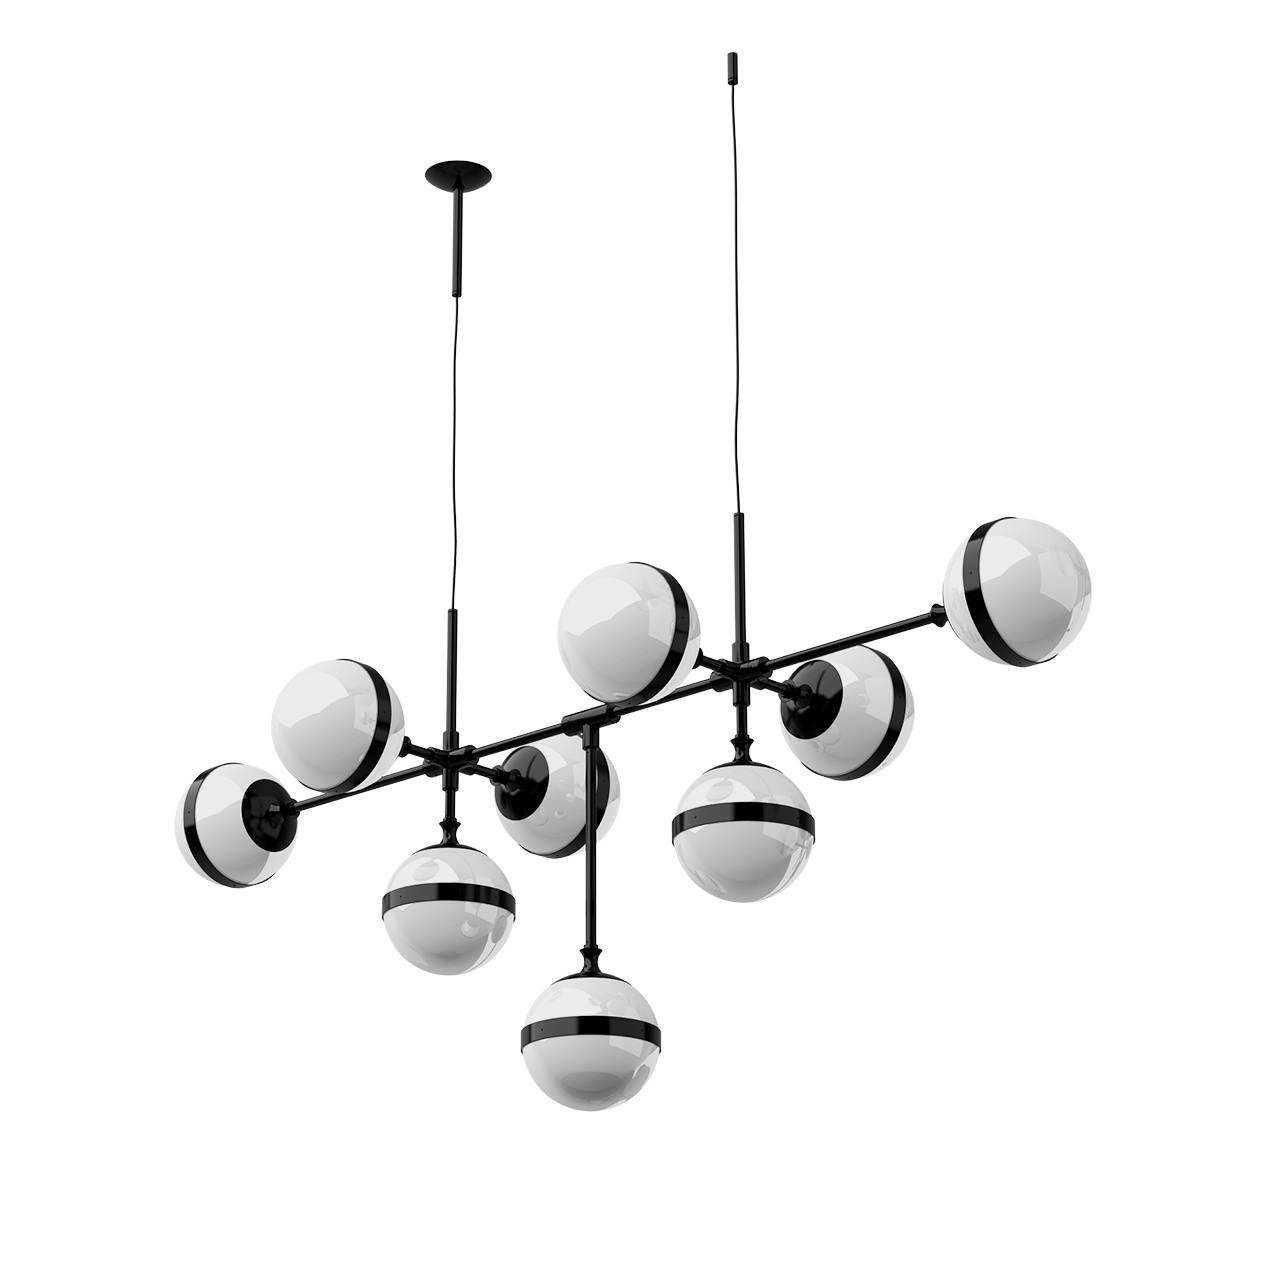 Peggy SP Pendant Lamp by Vetreria Vistosi